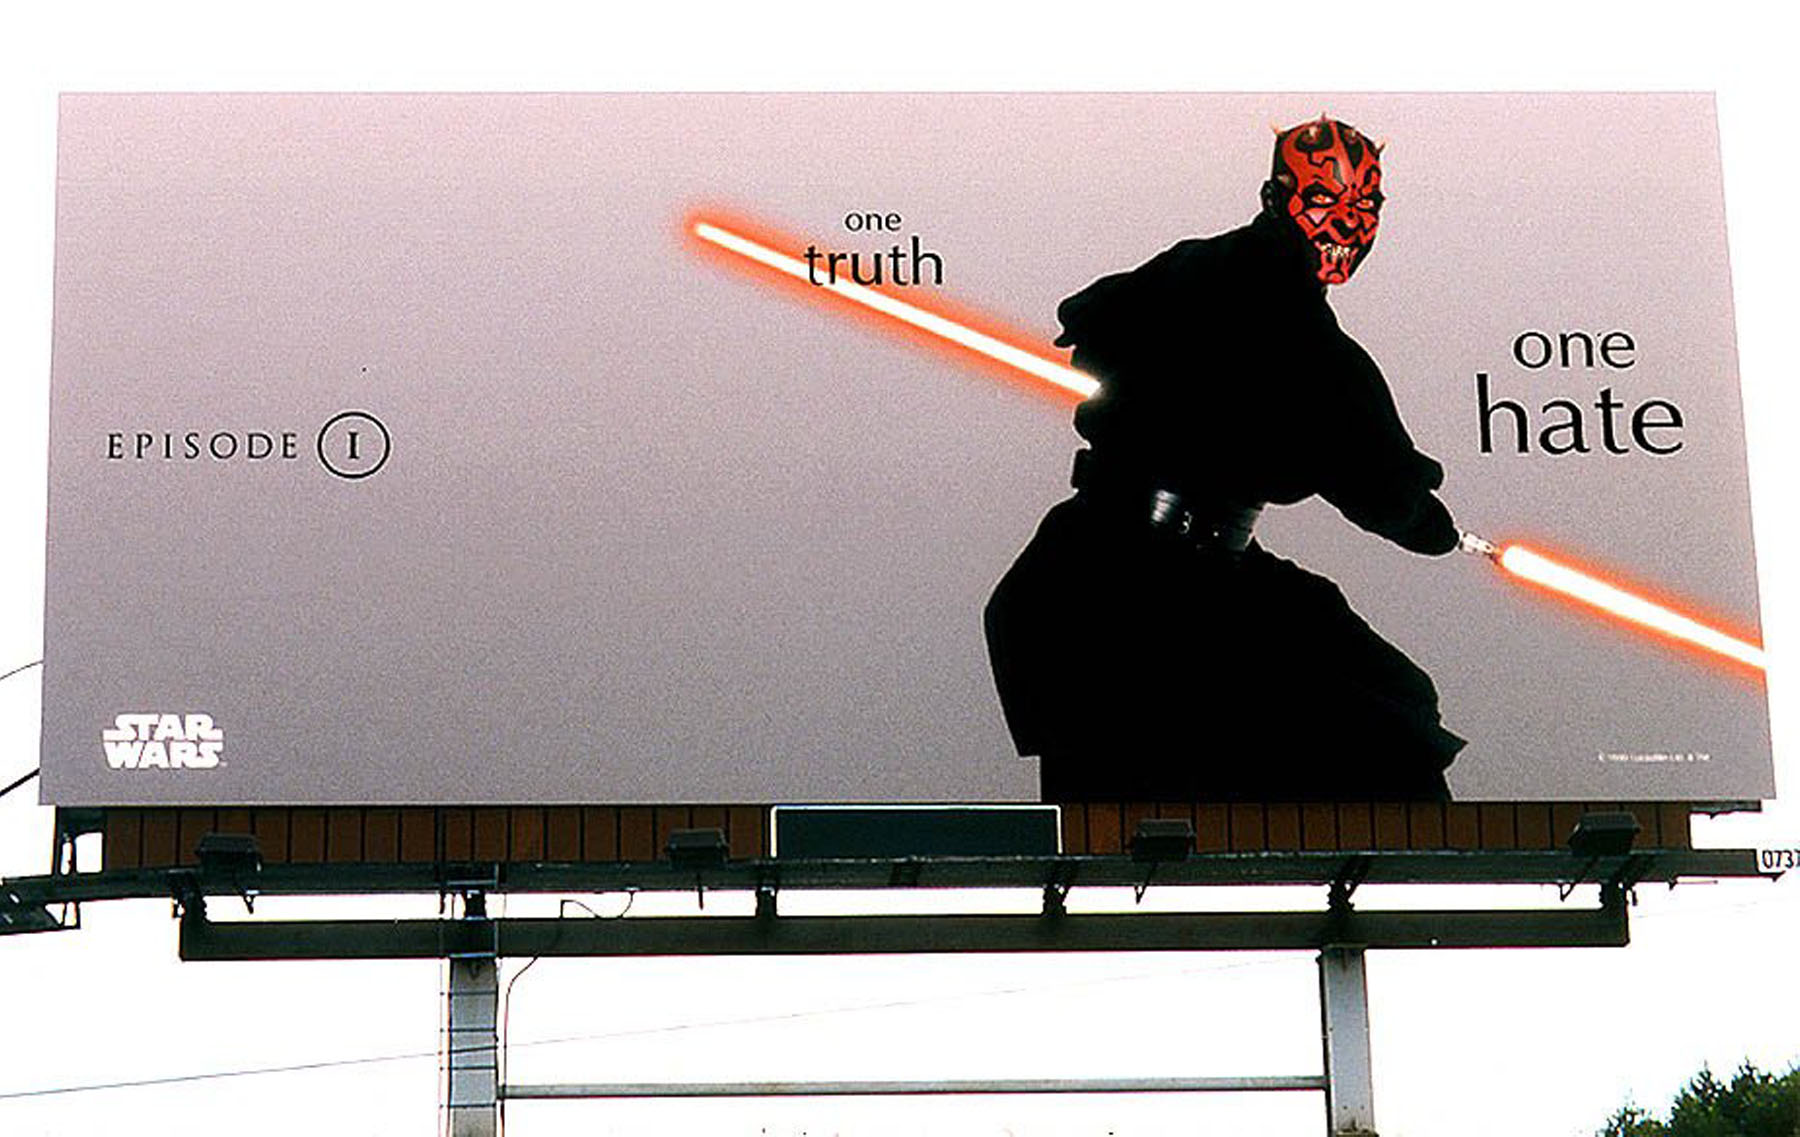 Star Wars Episode I advertising